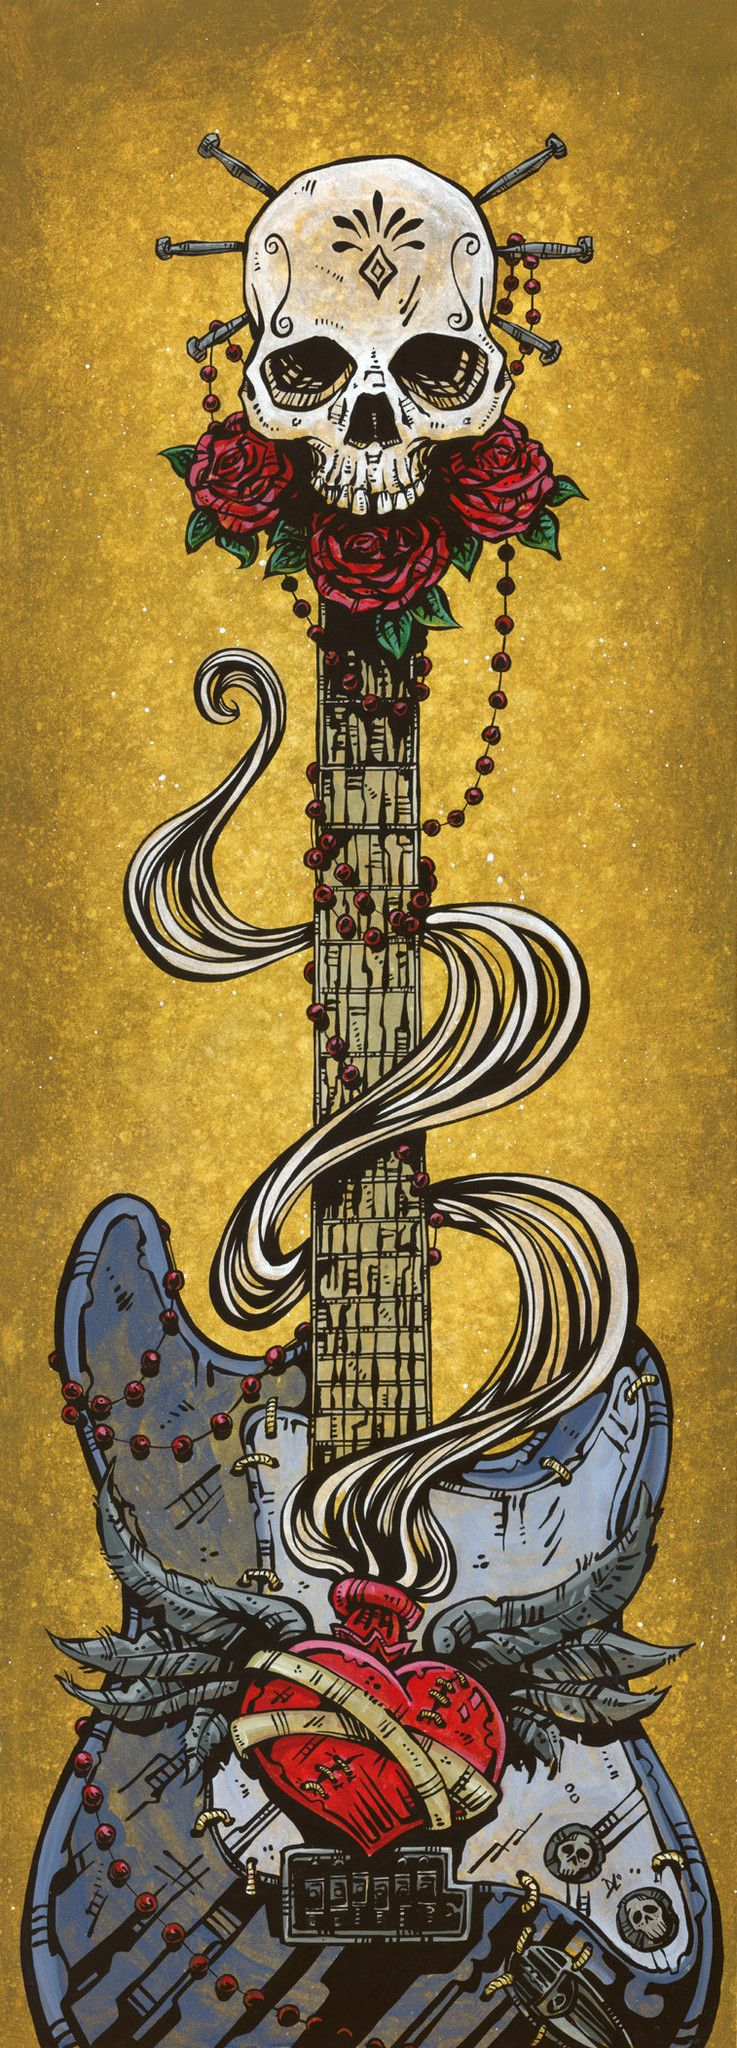 Day of the Dead Art by David Lozeau, Day of the Dead Strat, Dia de los Muertos Art - 1